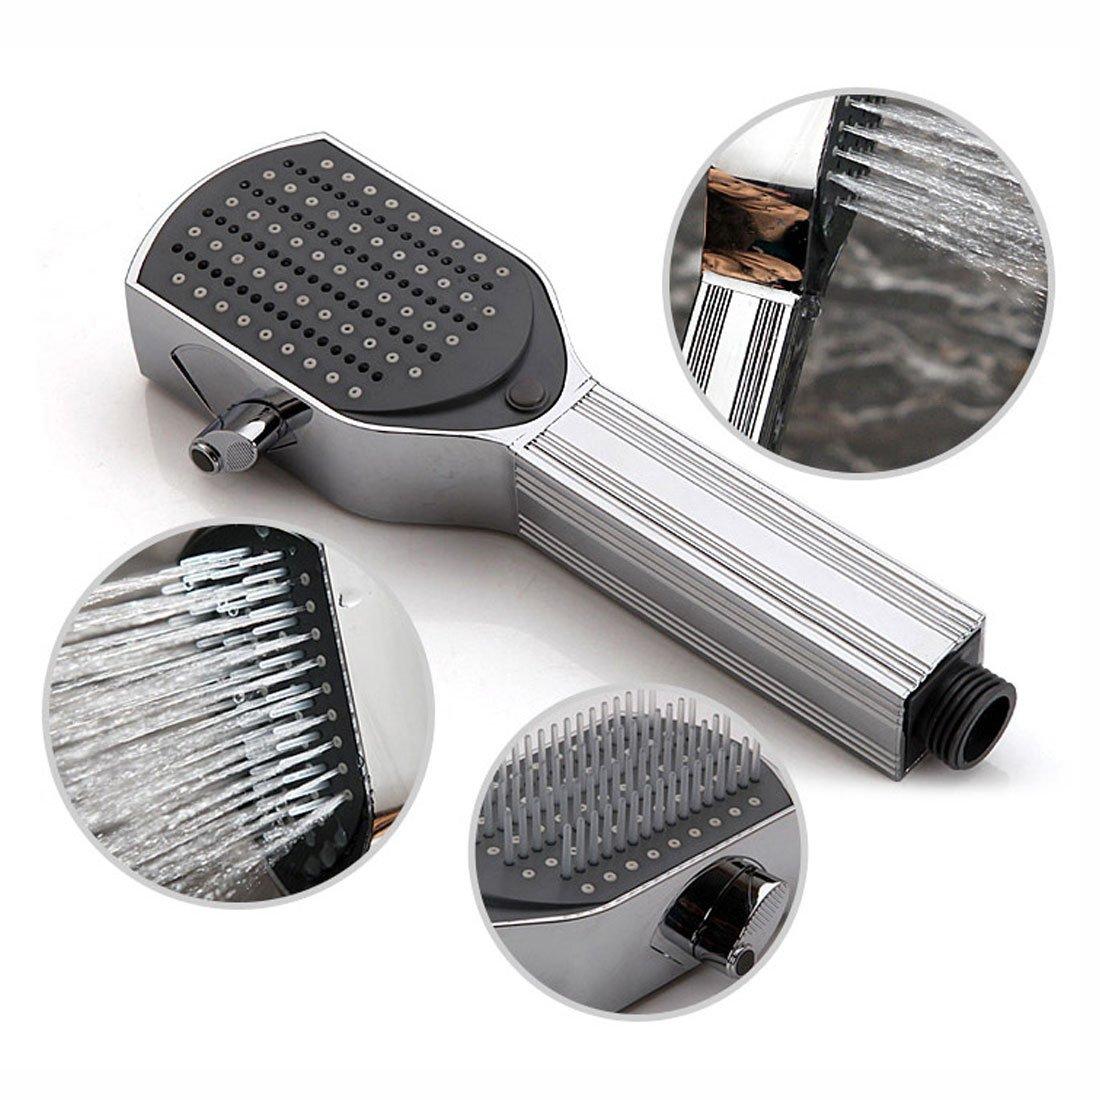 2 in 1 Pet Grooming Brush Pet Cat Hair Massager Shower Head